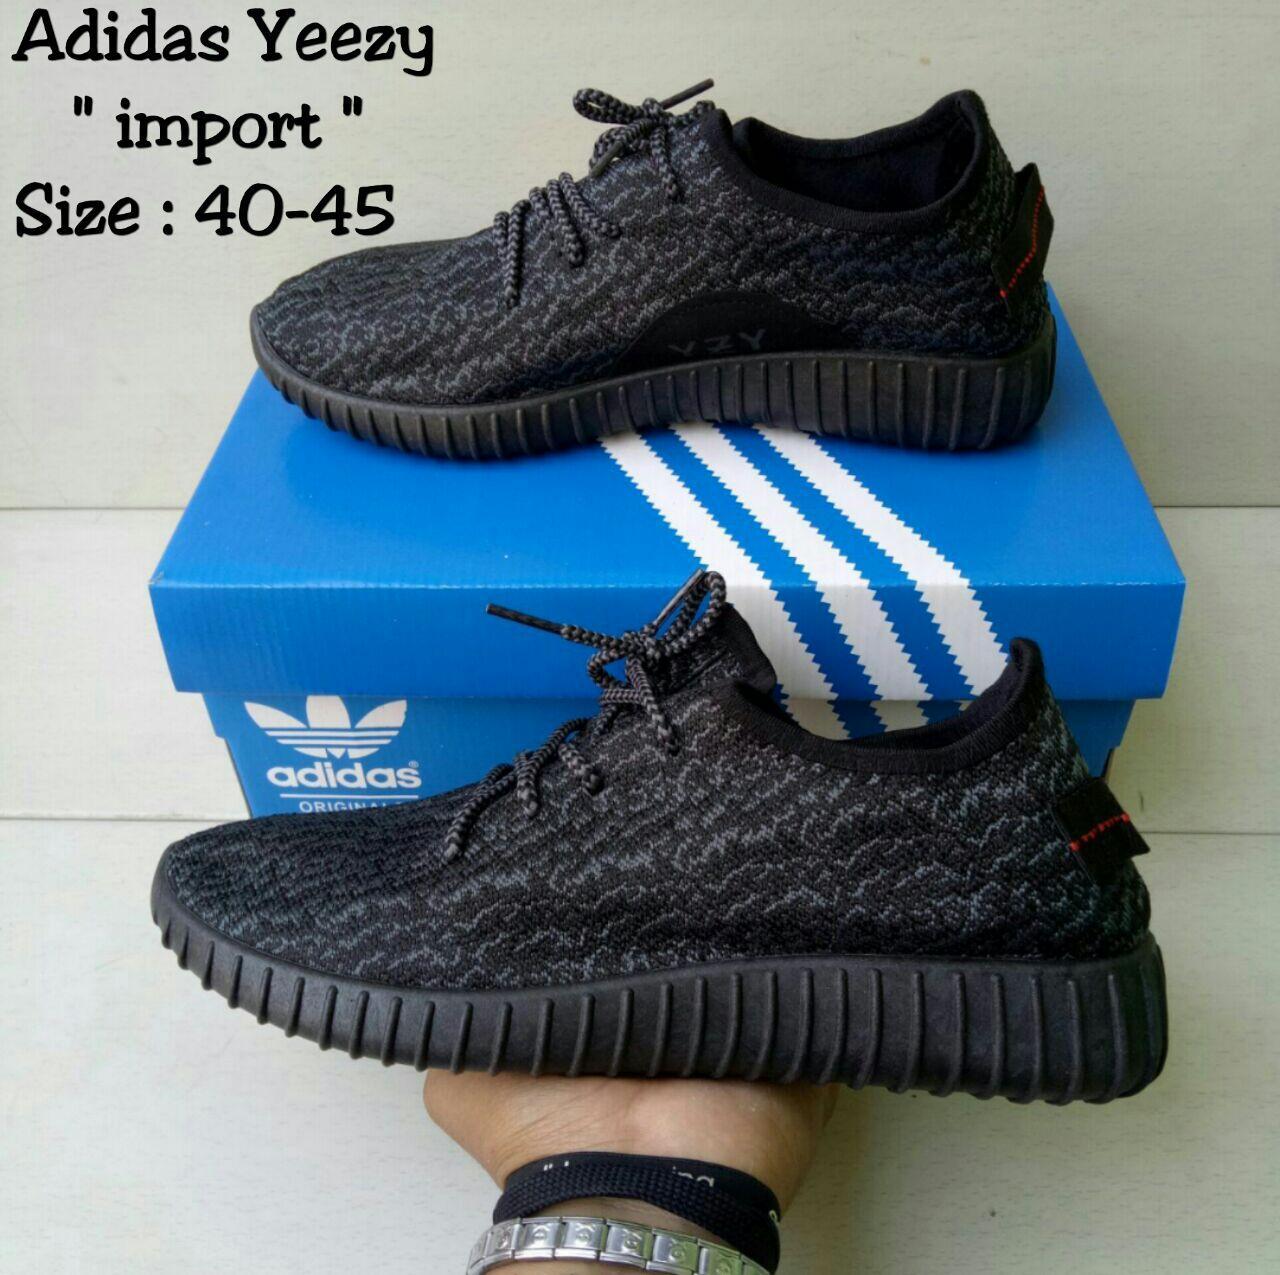 Adidas Yeezy Import Black